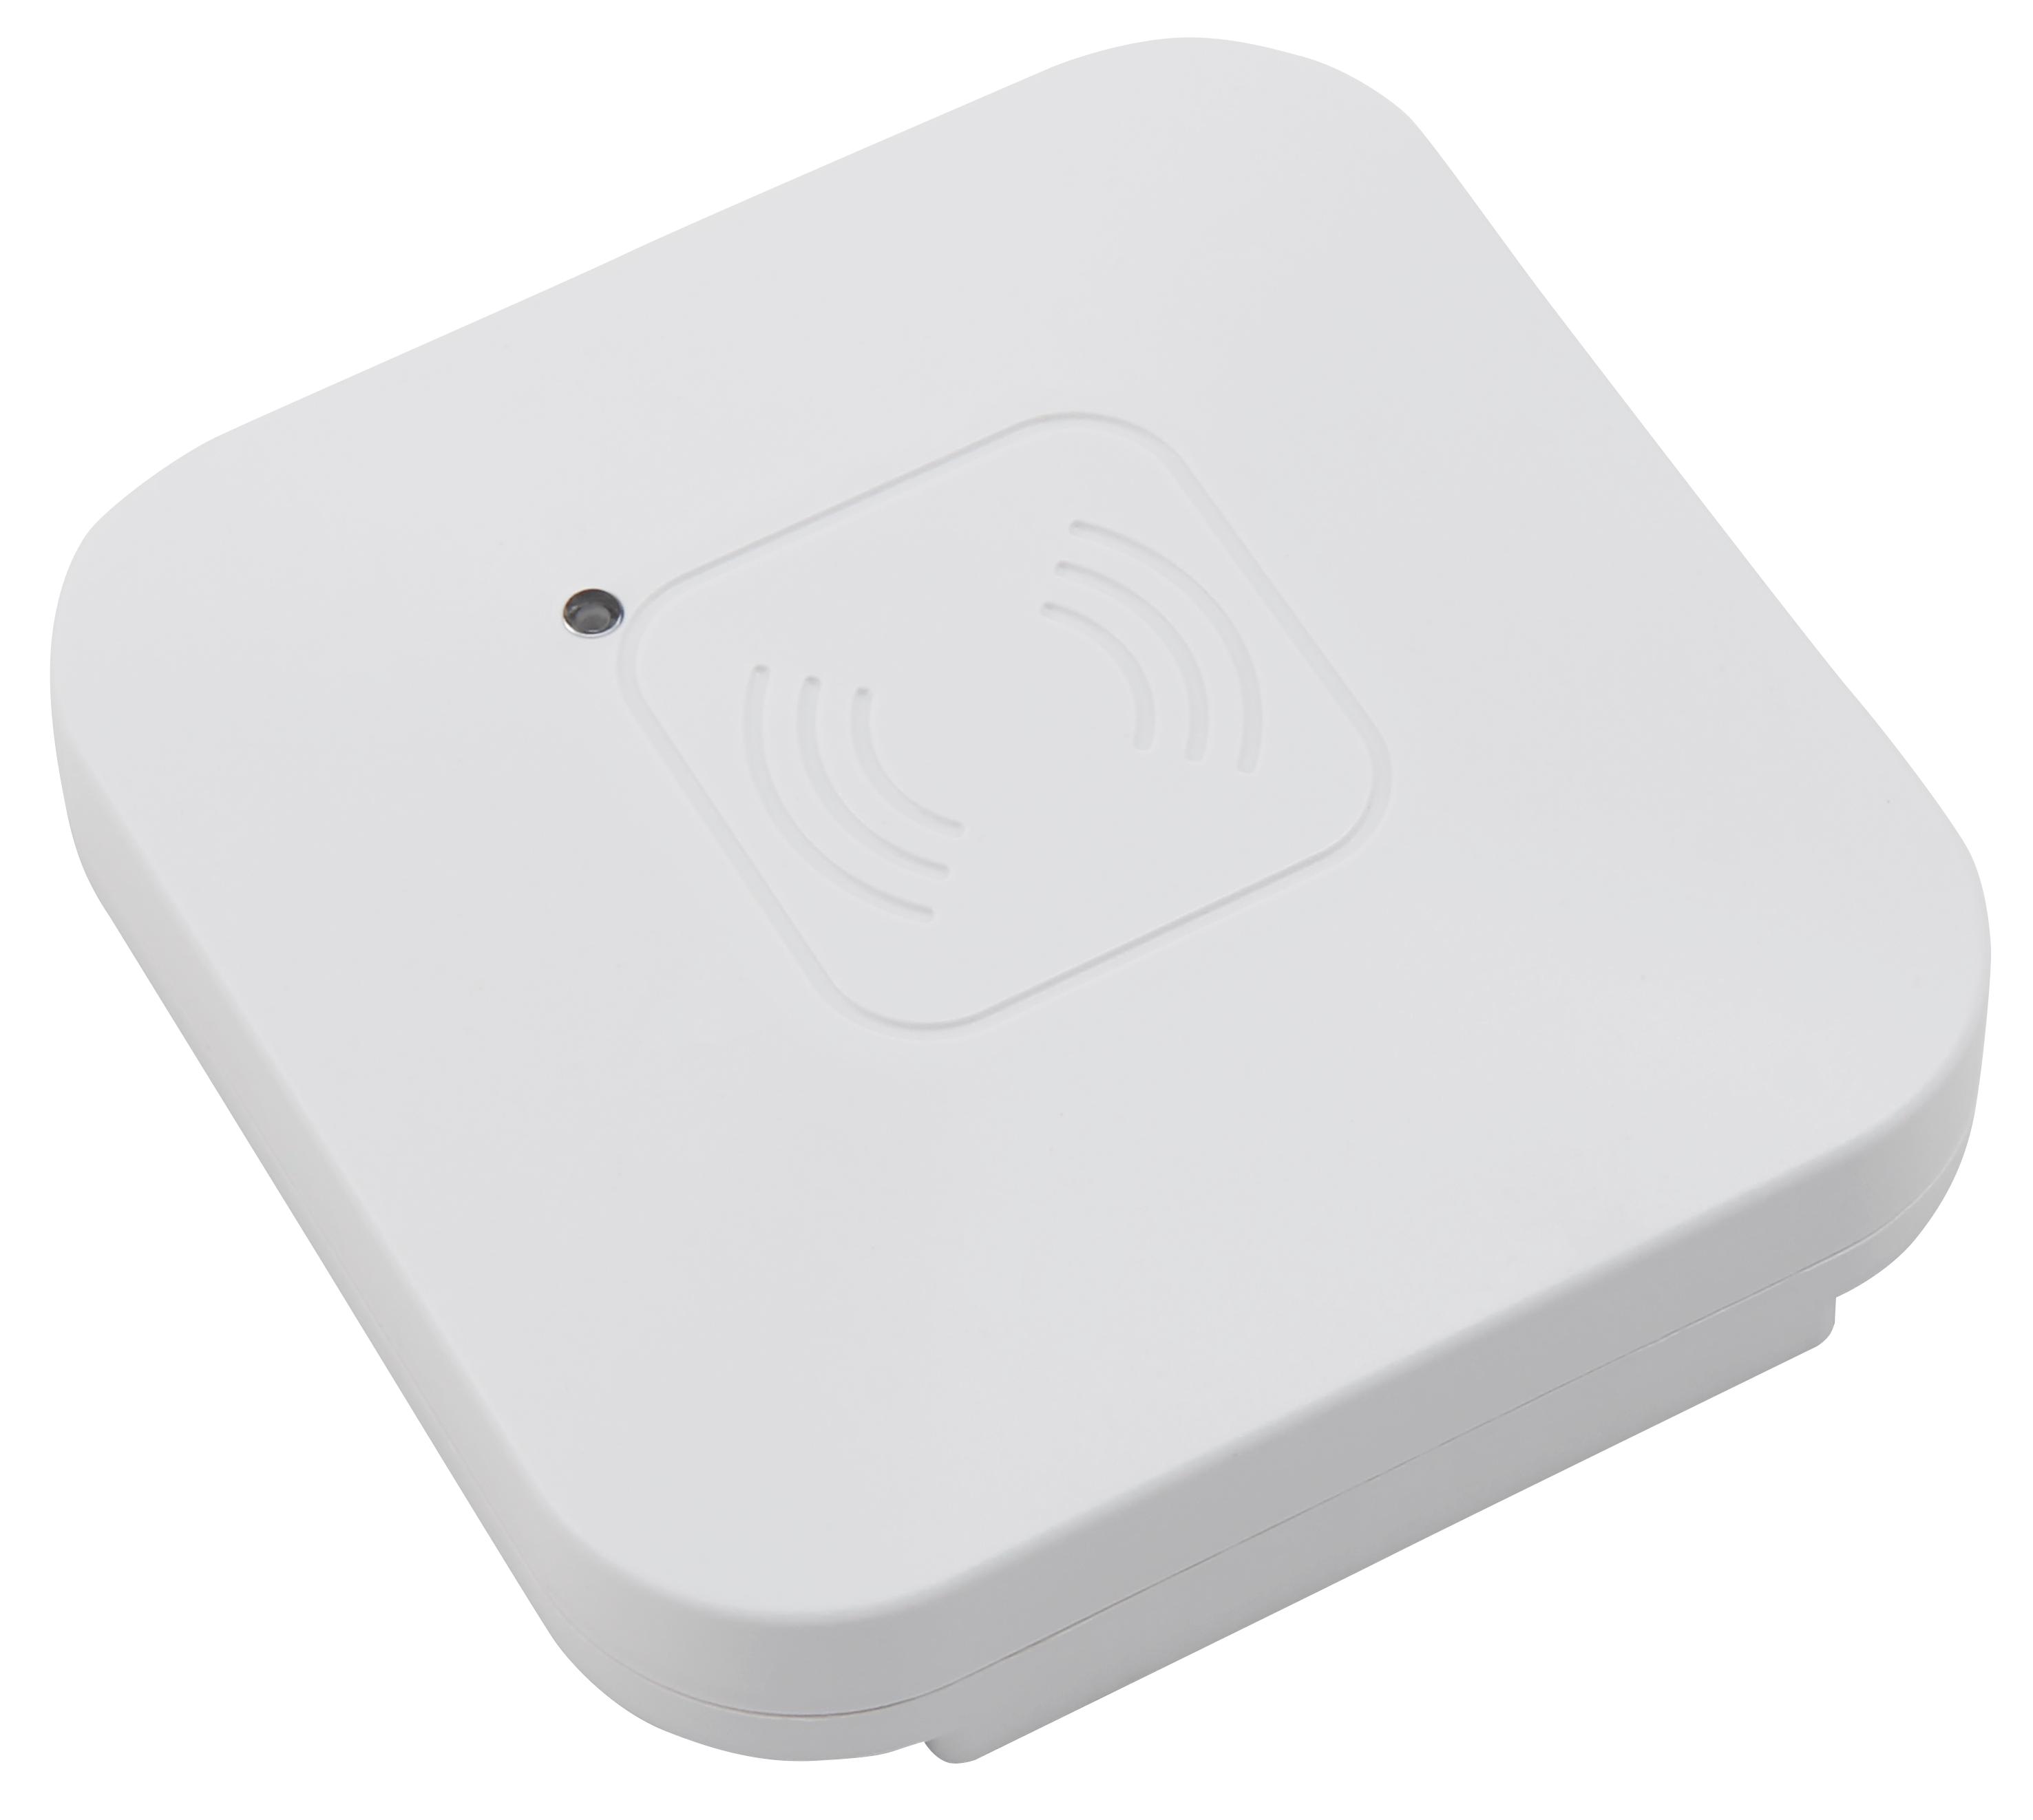 HF / Mikrowellen-Bewegungsmelder McShine ''LX-710'' 360°, 800W, weiß, LED geeignet